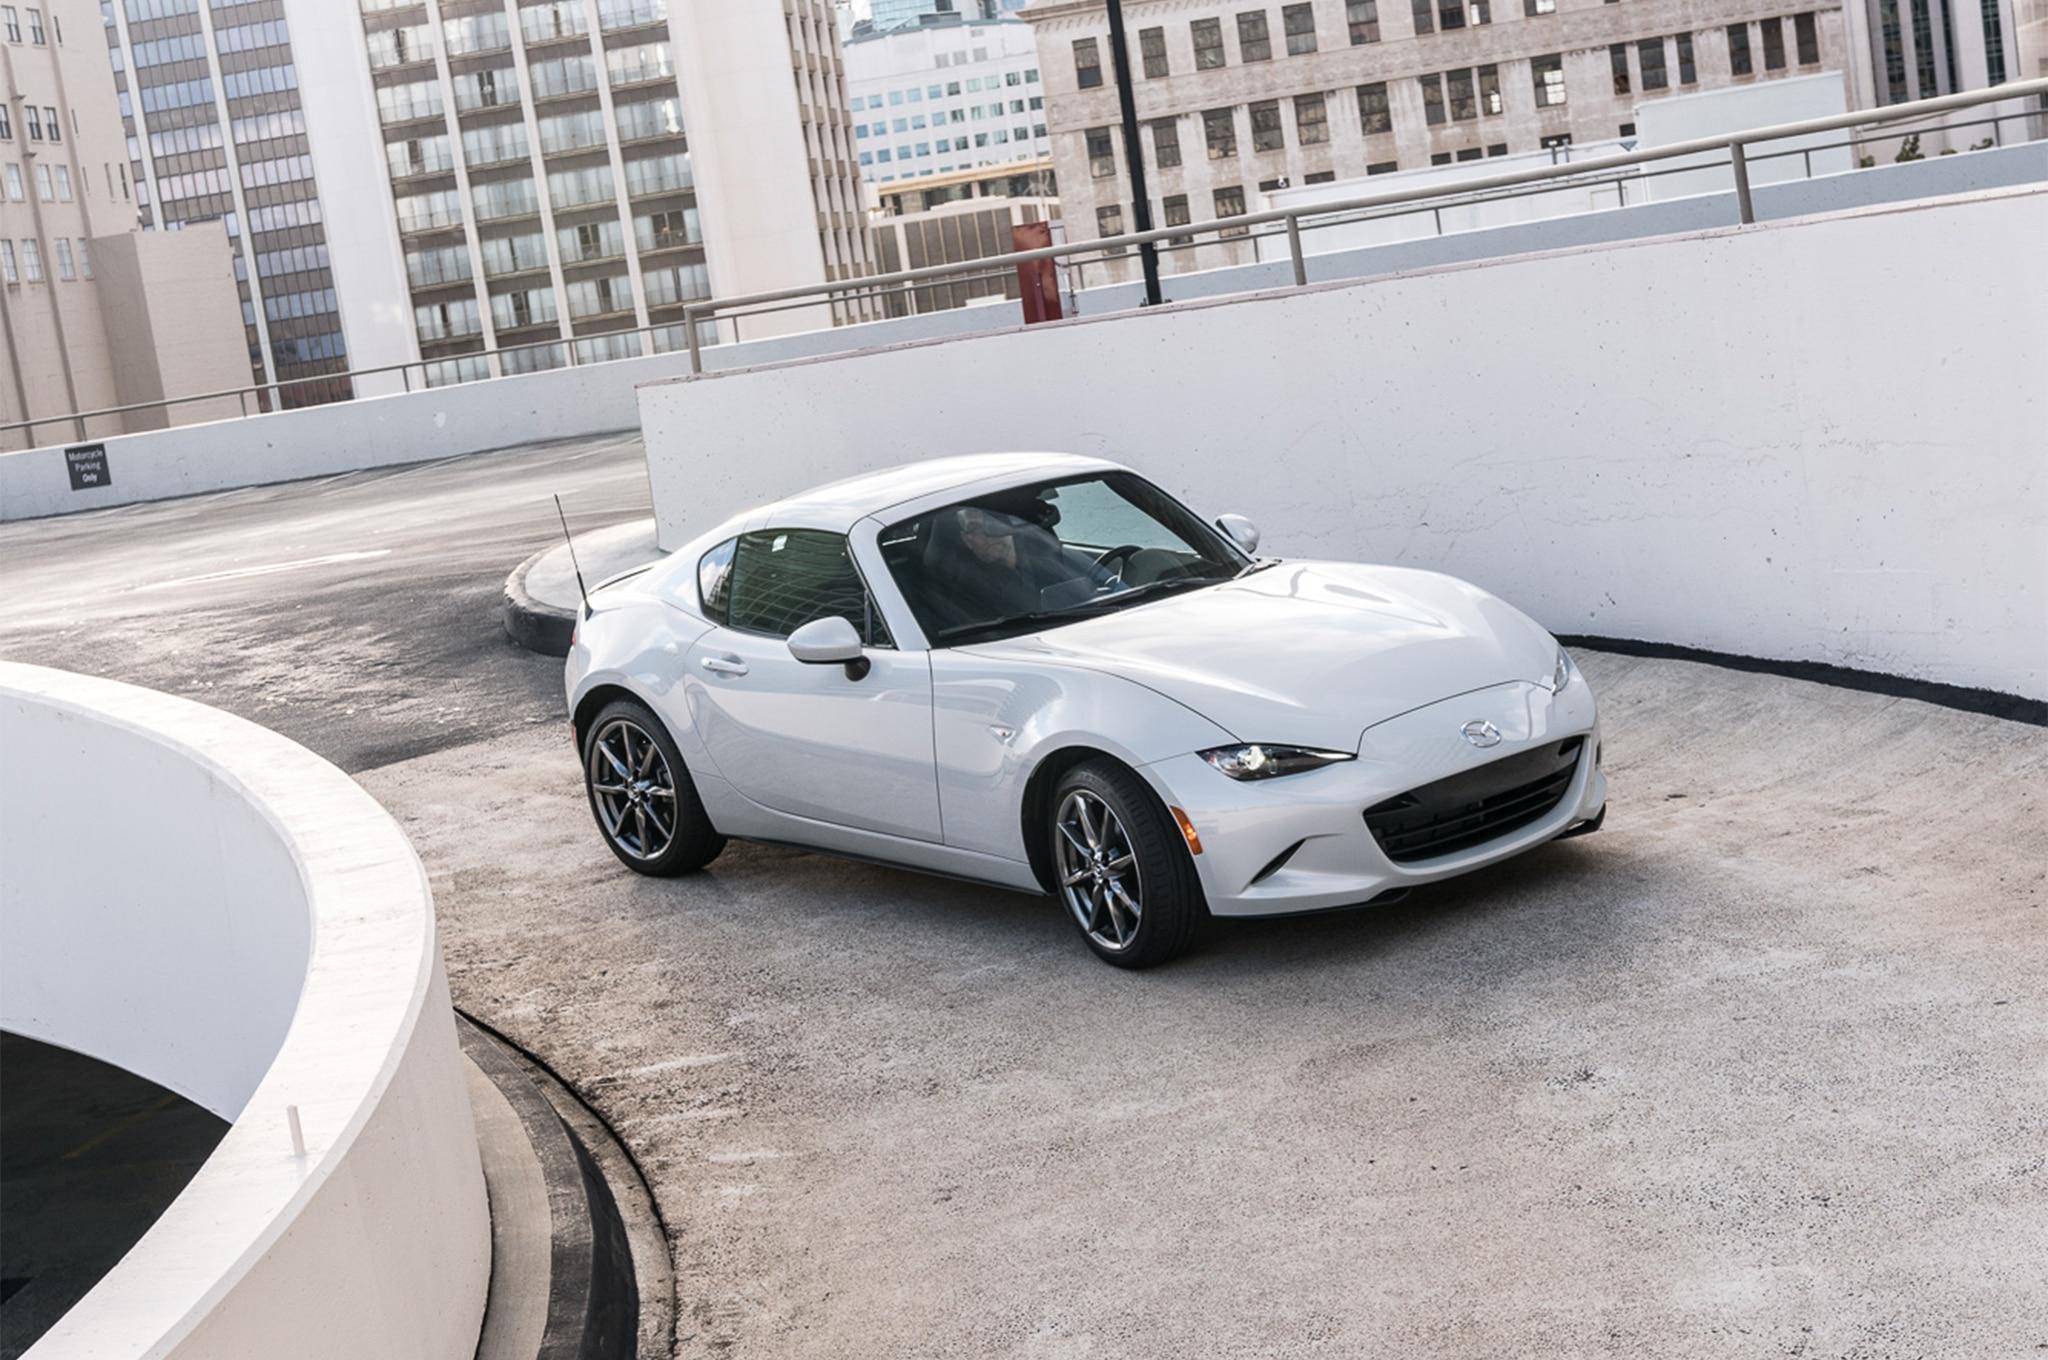 2017 mazda mx 5 miata rf first drive review automobile. Black Bedroom Furniture Sets. Home Design Ideas